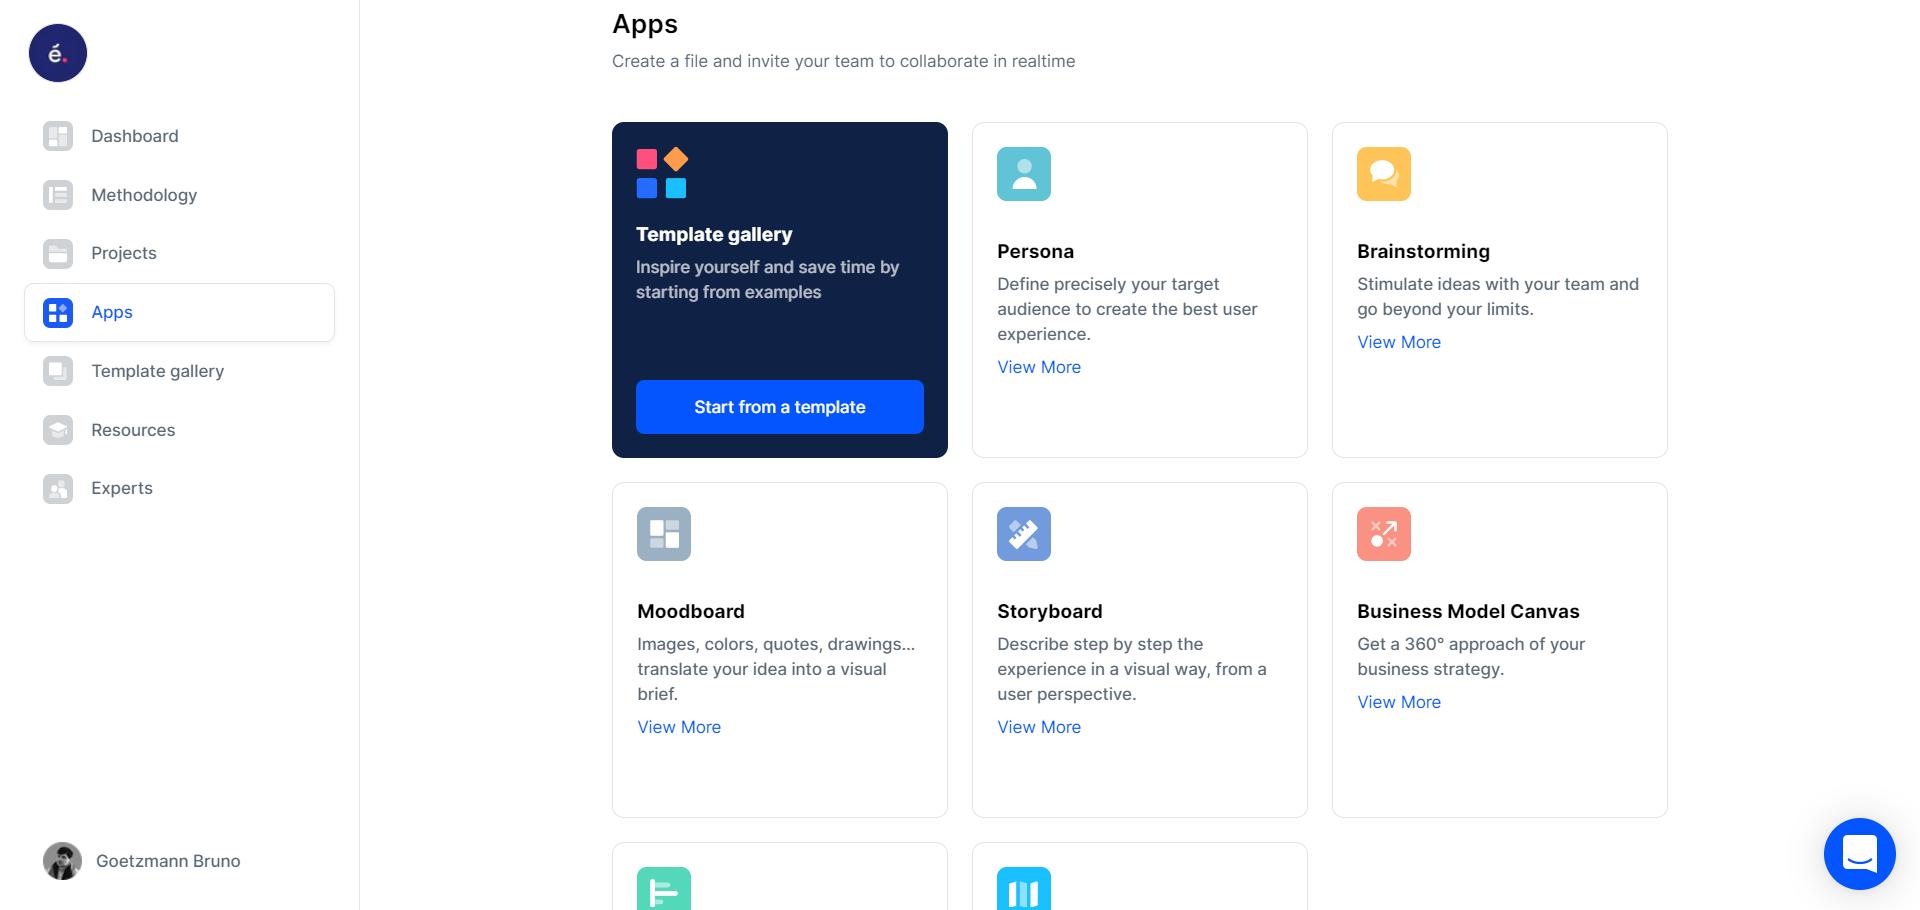 List of Evolt apps